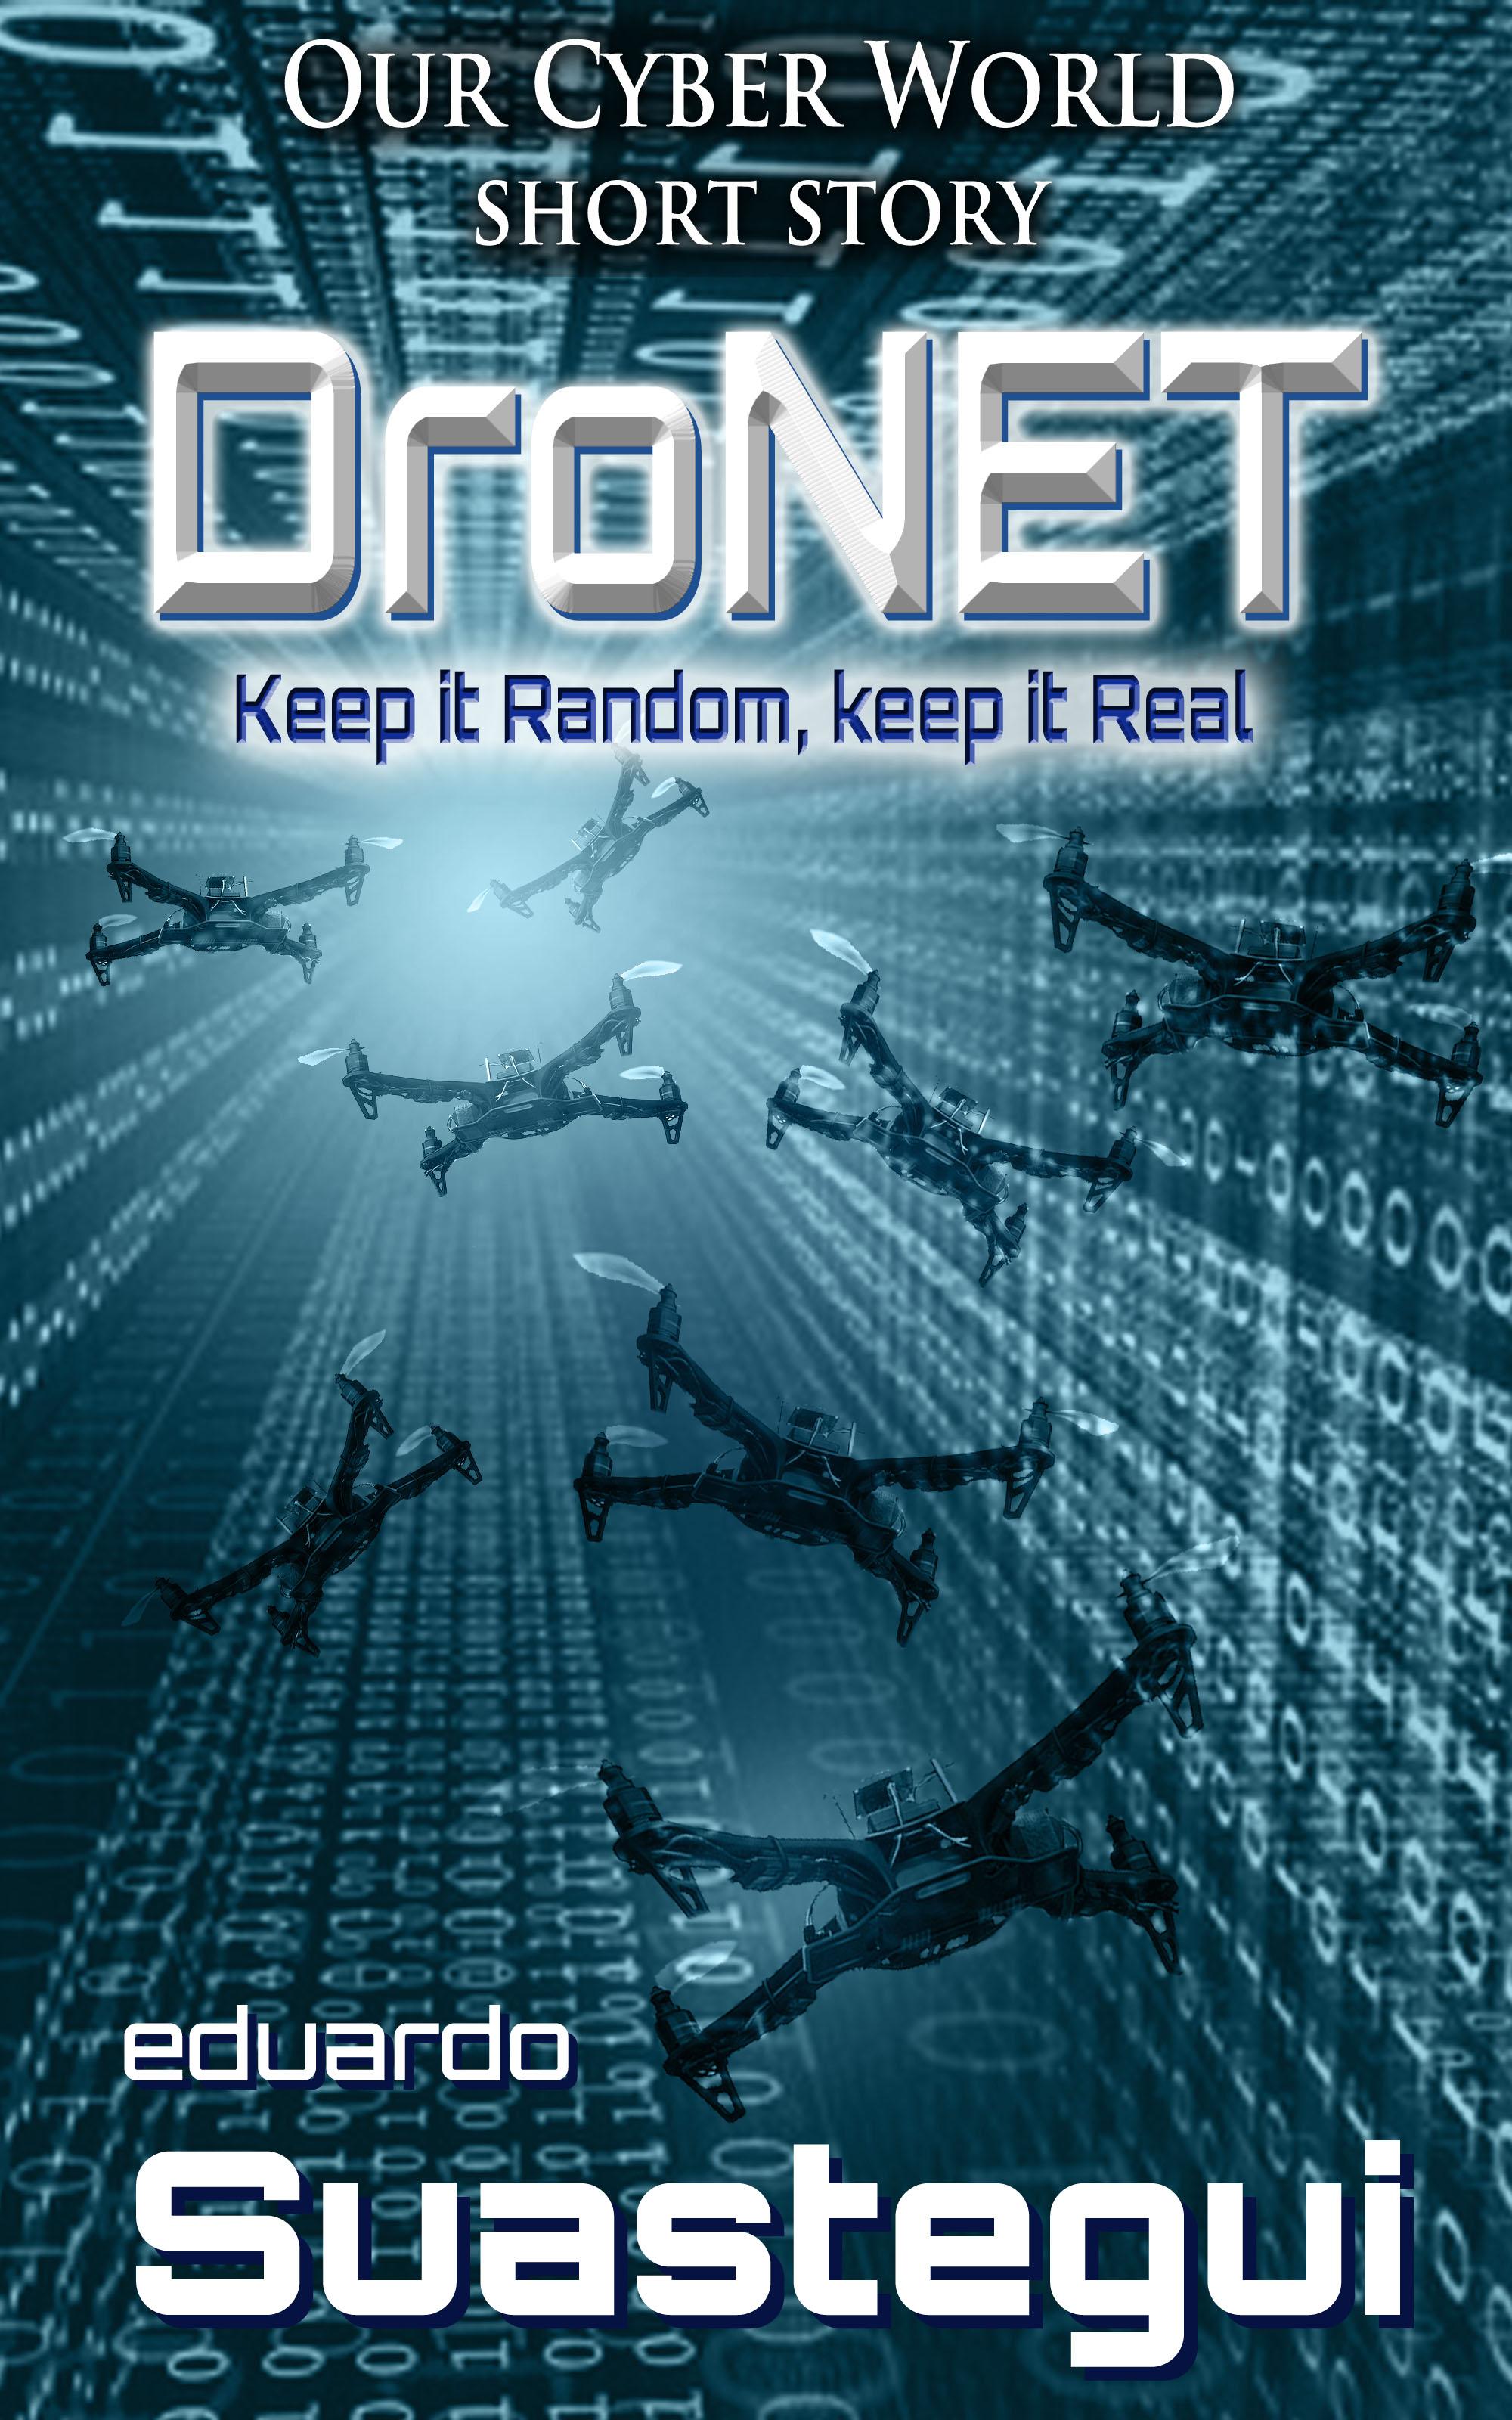 An Our Cyber World Short Story By Eduardo Suastegui